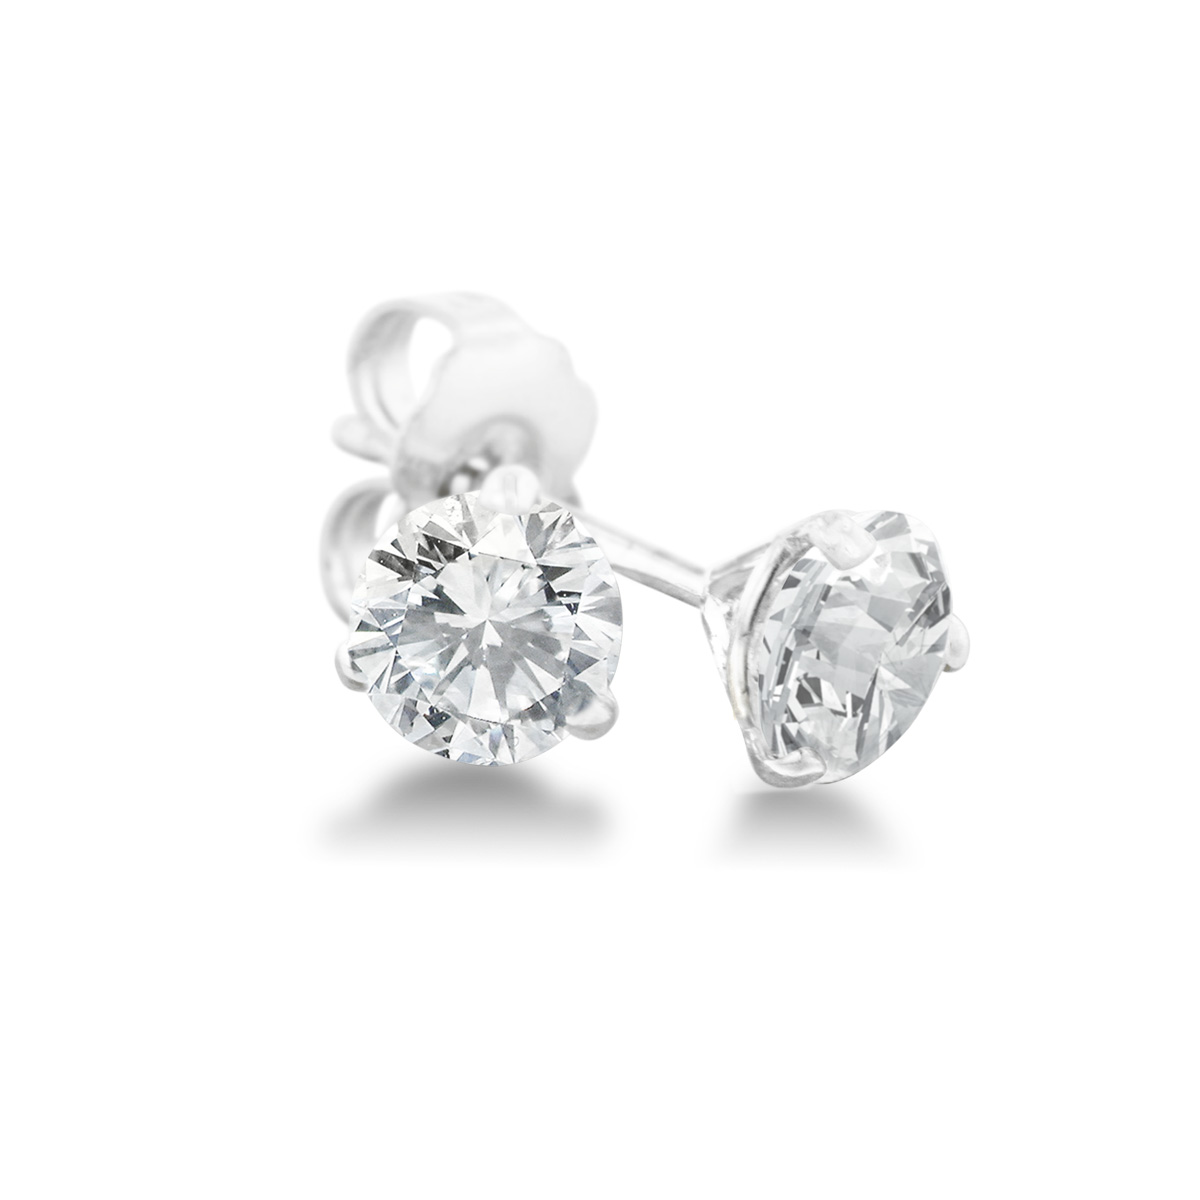 1 3ct Natural Genuine Diamond Stud Earrings In Martini Settling, 14 Ka